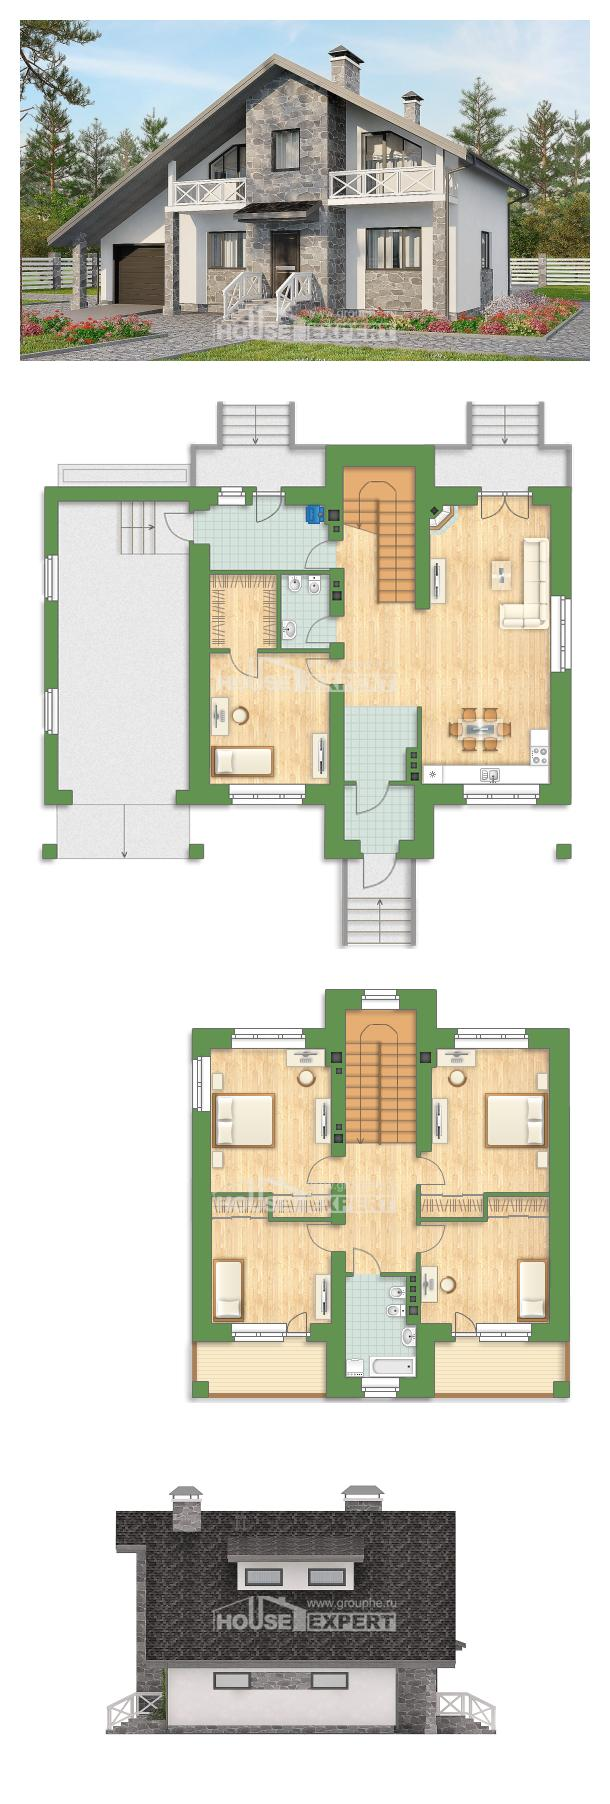 Proyecto de casa 180-017-L   House Expert